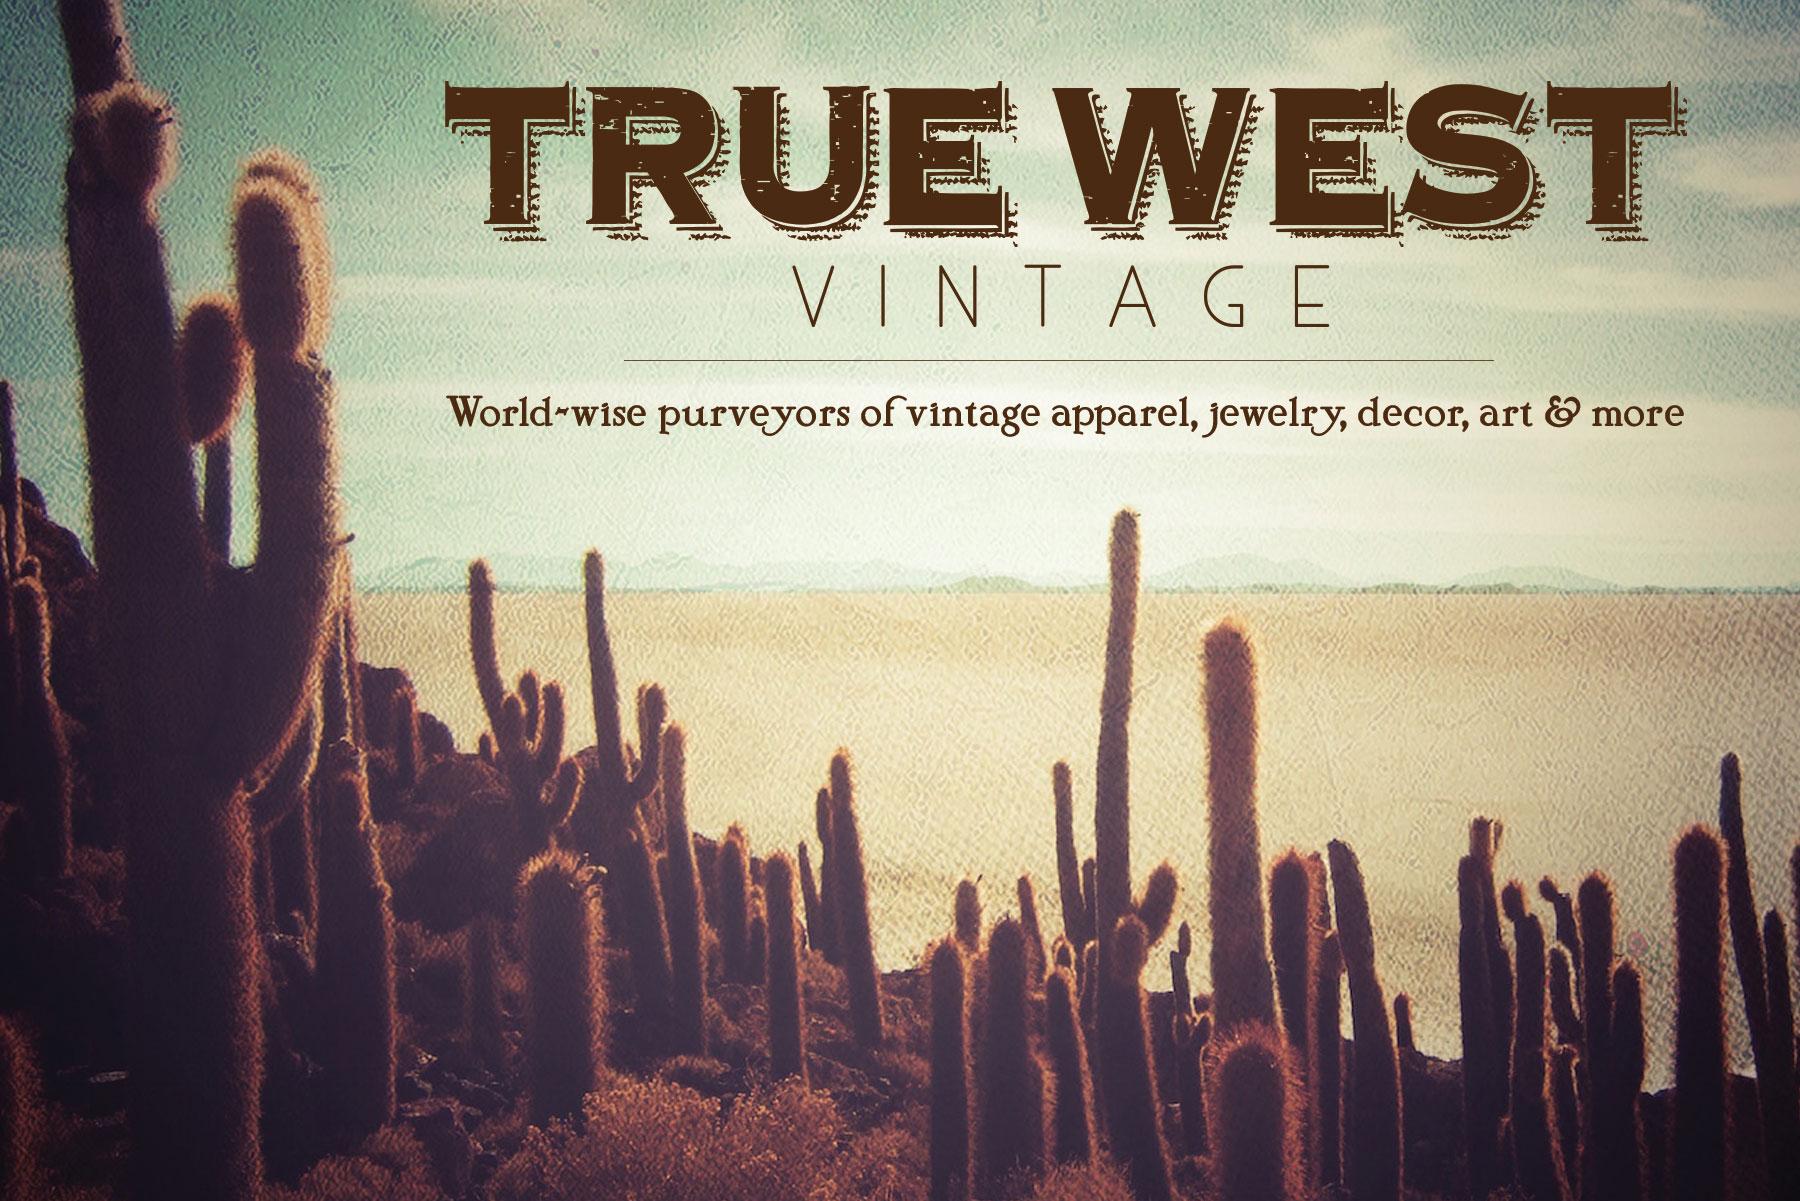 True West Vintage flyer designed and built by National Revue